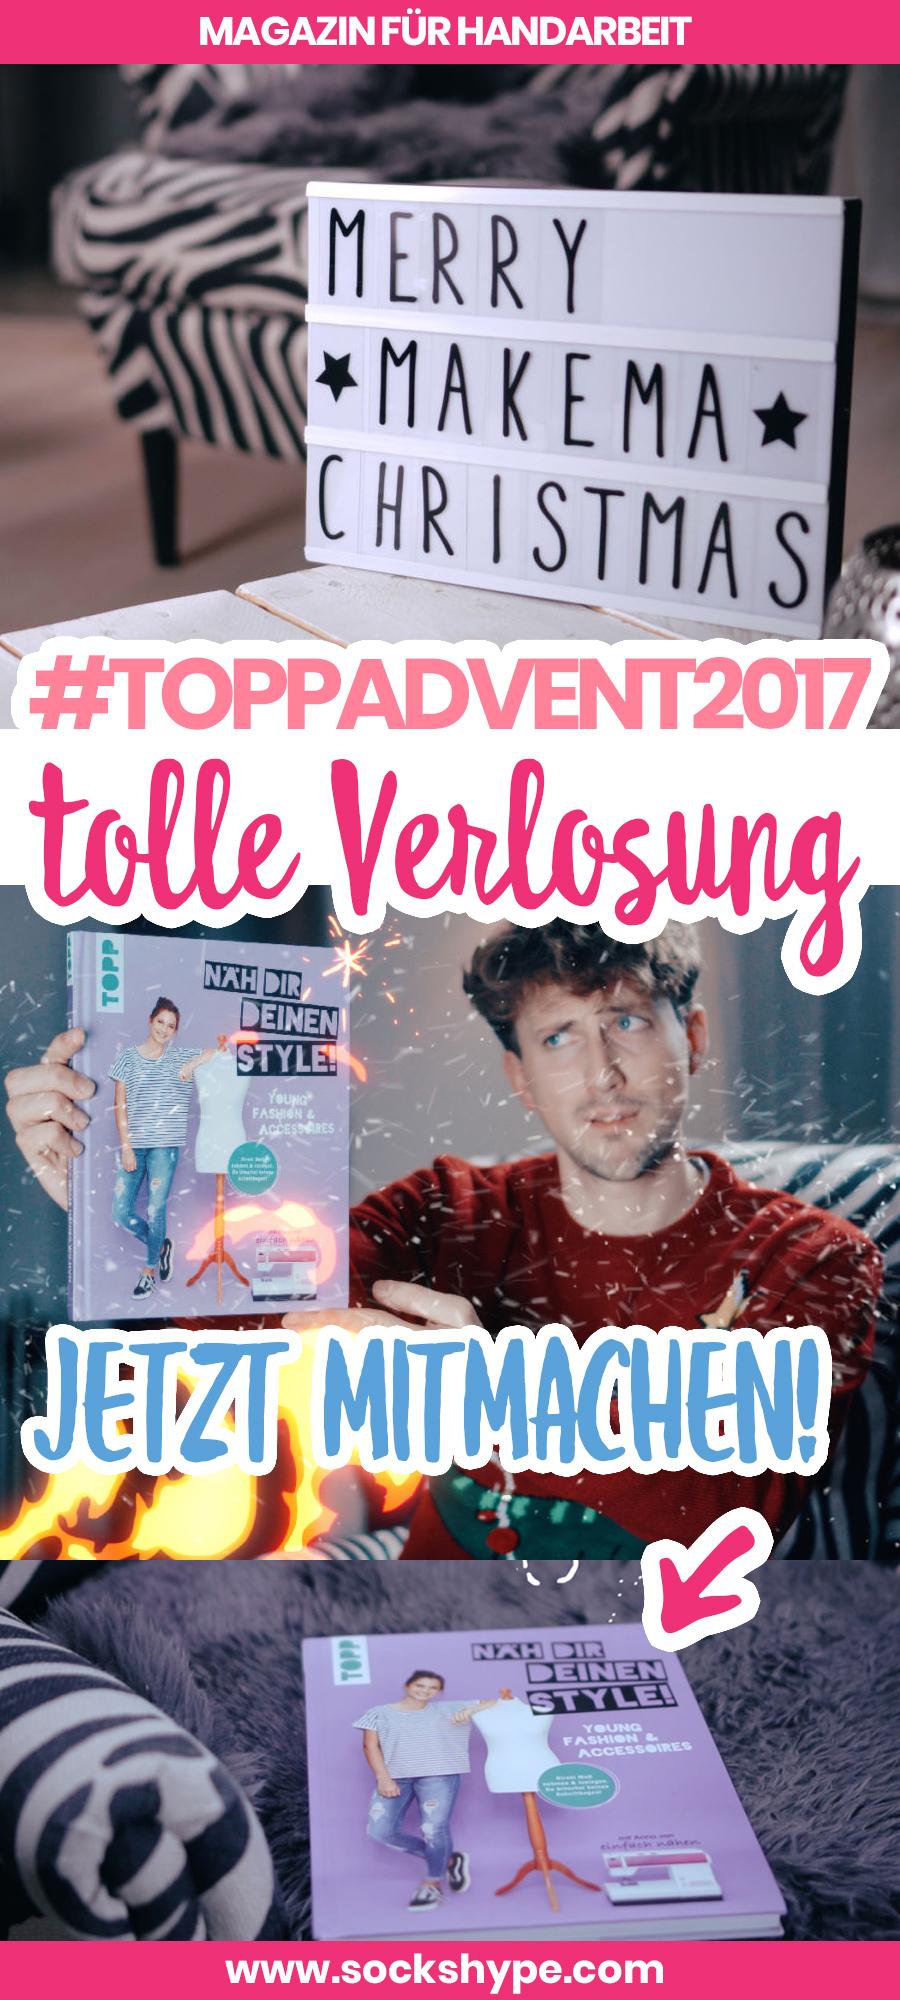 [object object] Der große TOPP Blogger-Adventskalender 2017 – Türchen Nr. 17